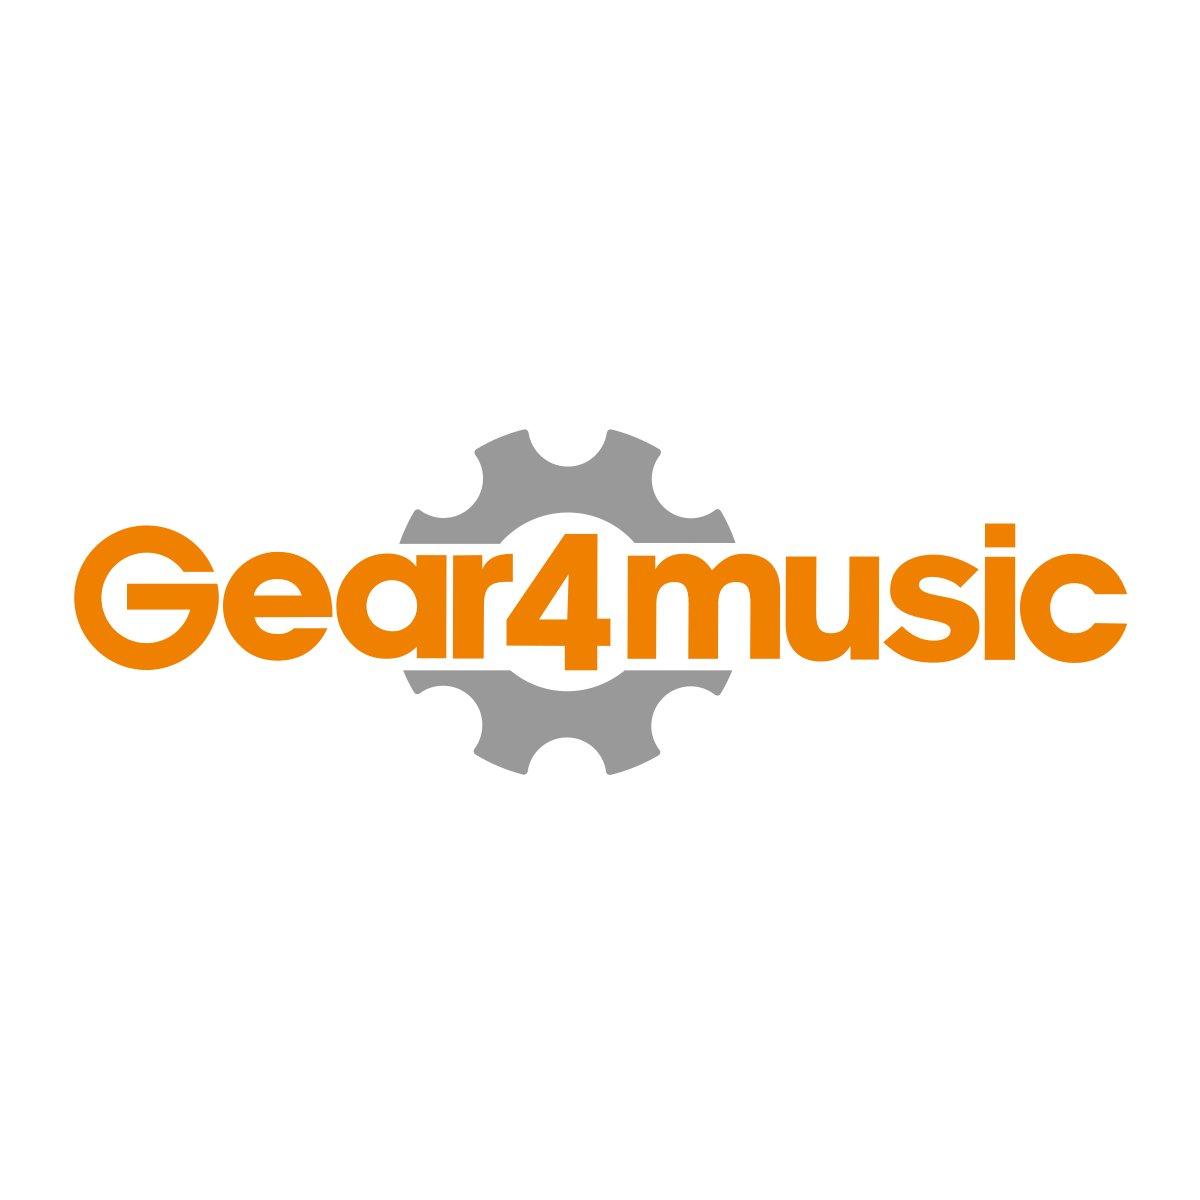 gear4music pianoforte digitale  DP-50 Pianoforte digitale Gear4music + kit accessori | Gear4music